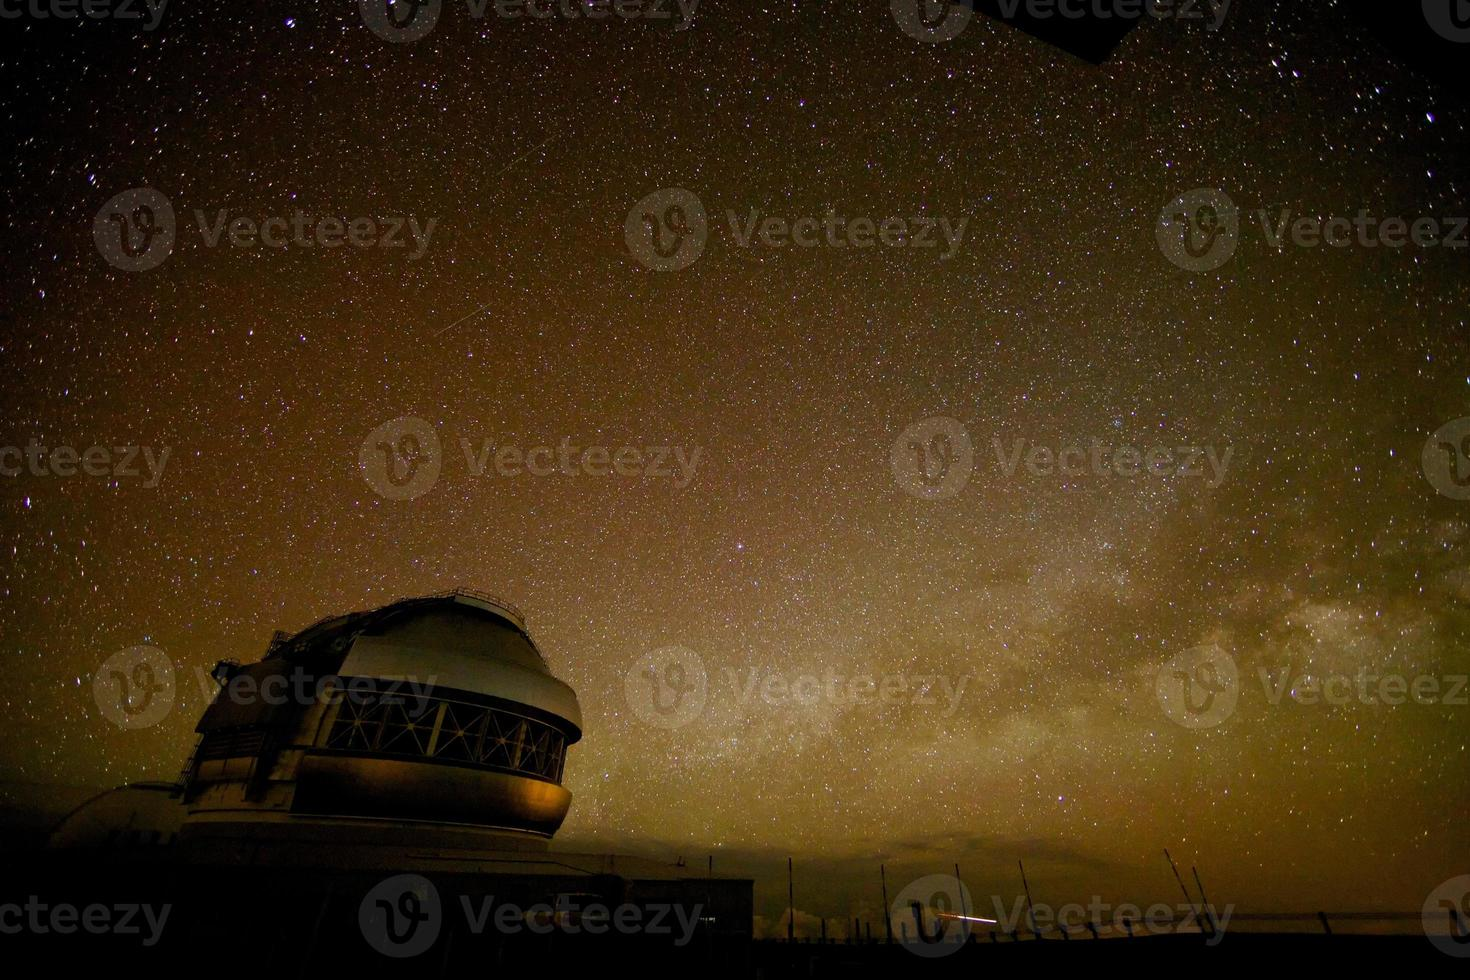 ruimteschip en de Melkweg foto